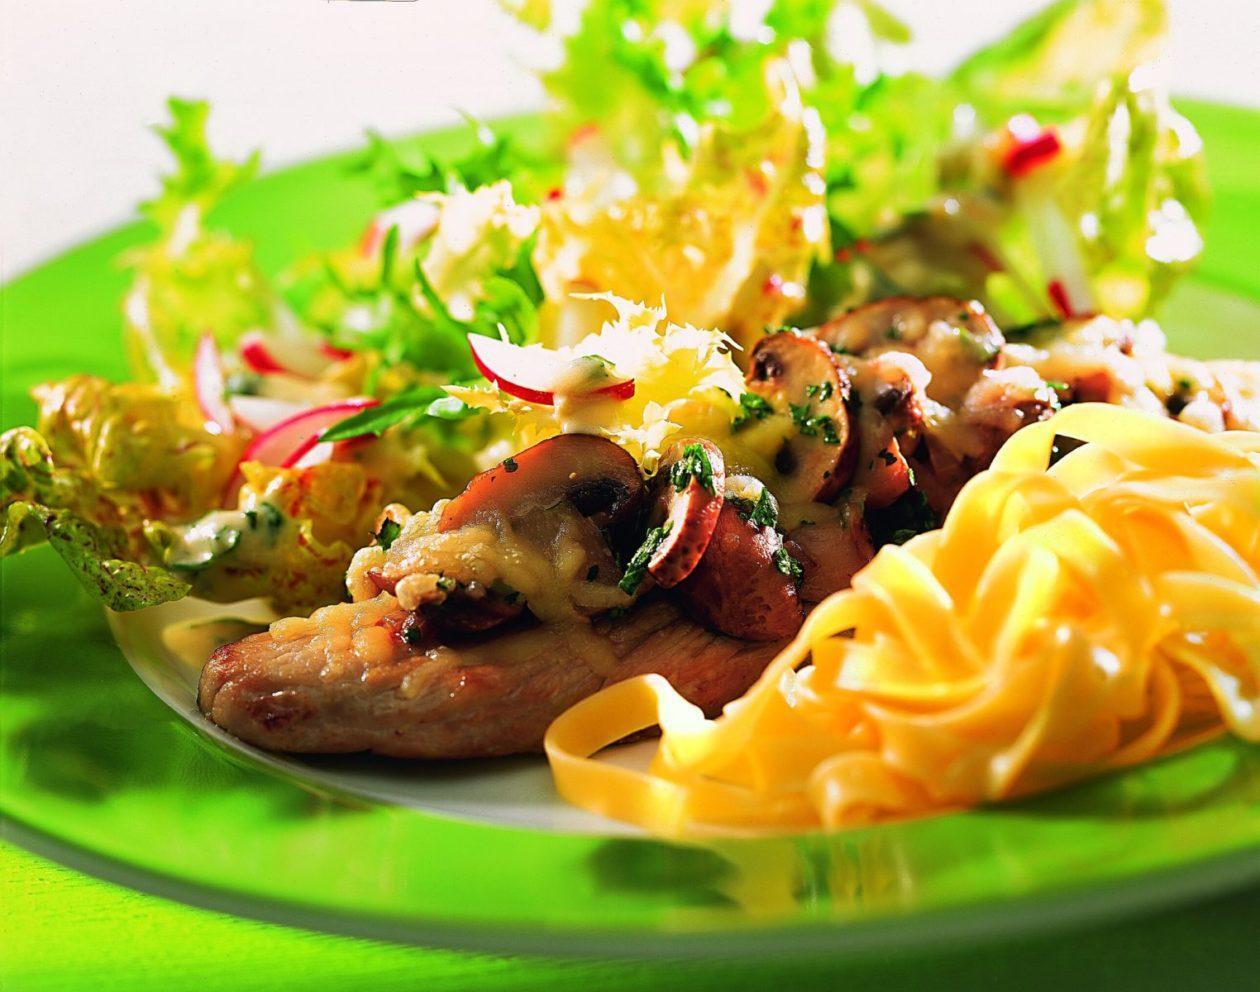 Gratinierte Champignonschnitzel - BCM Diät Rezepte.at